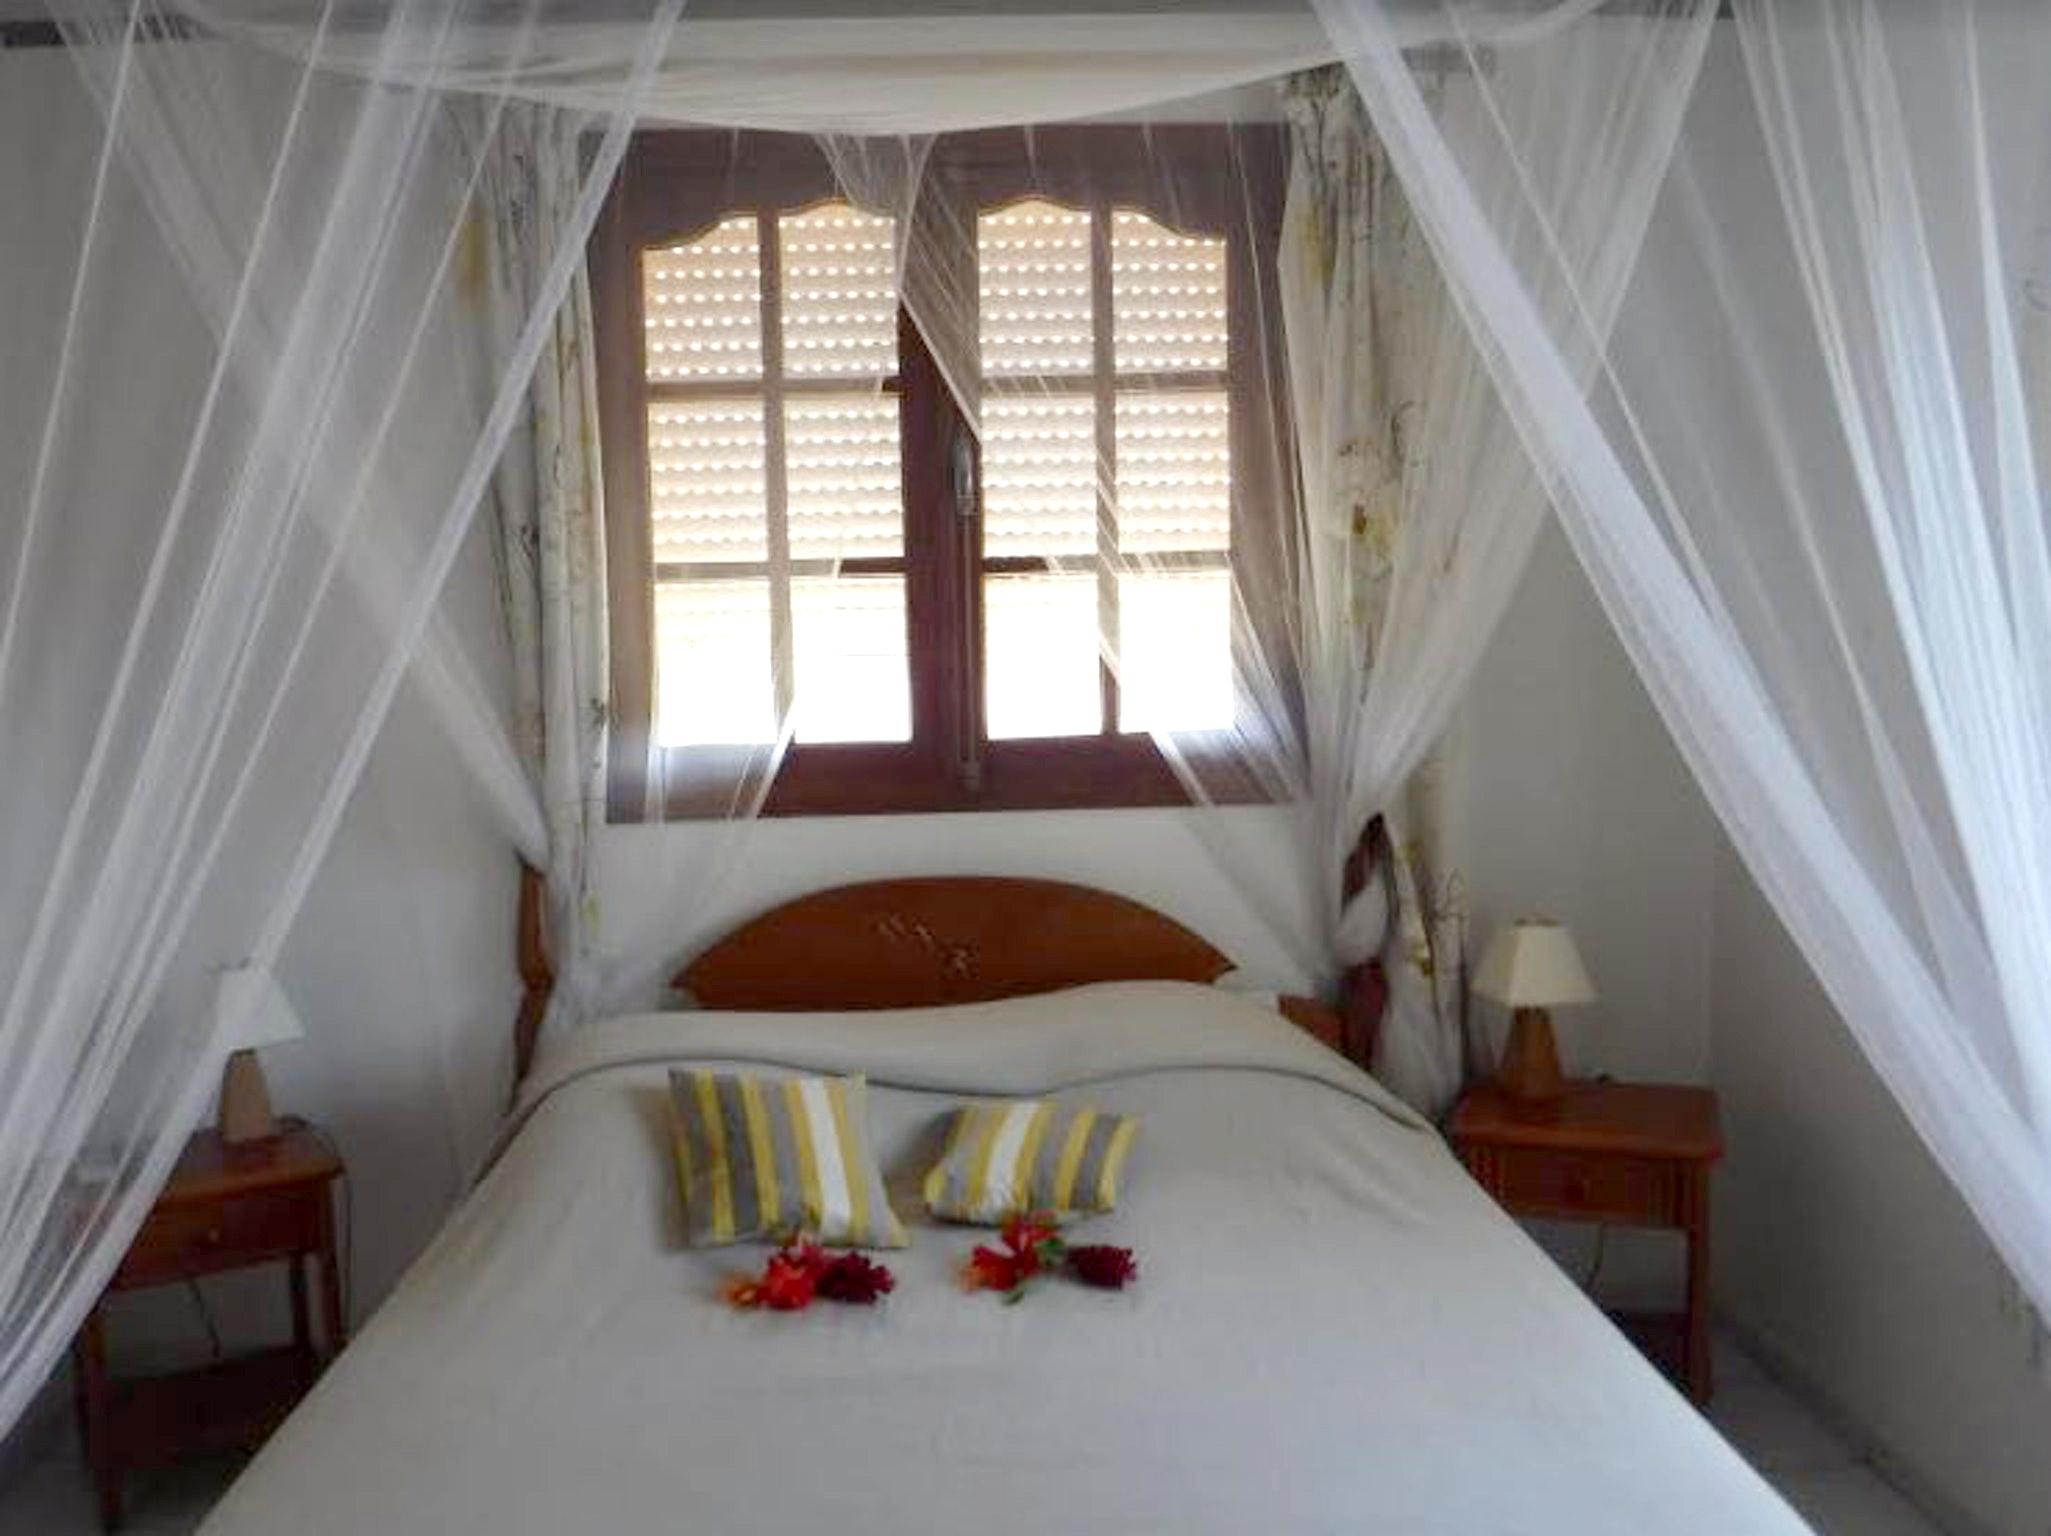 Bungalow mit 2 Schlafzimmern in Bouillante  mit he Hütte in Guadeloupe